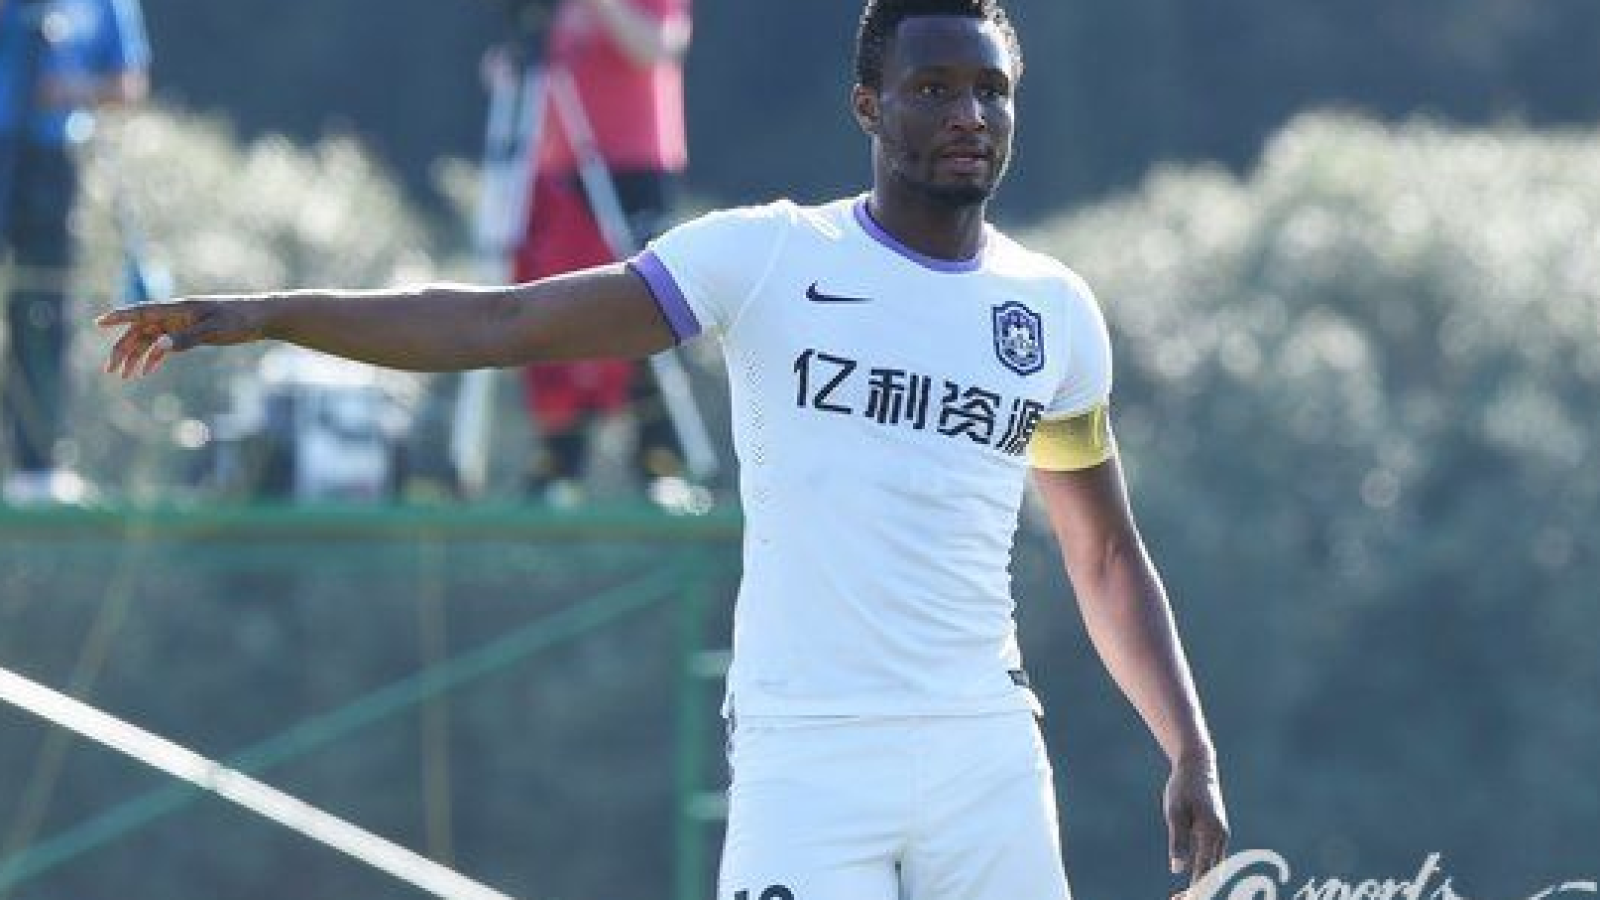 CSL: Nigerian Stars Martins, Obi, Ighalo, Ideye, Battle Ready For Weekend Matches